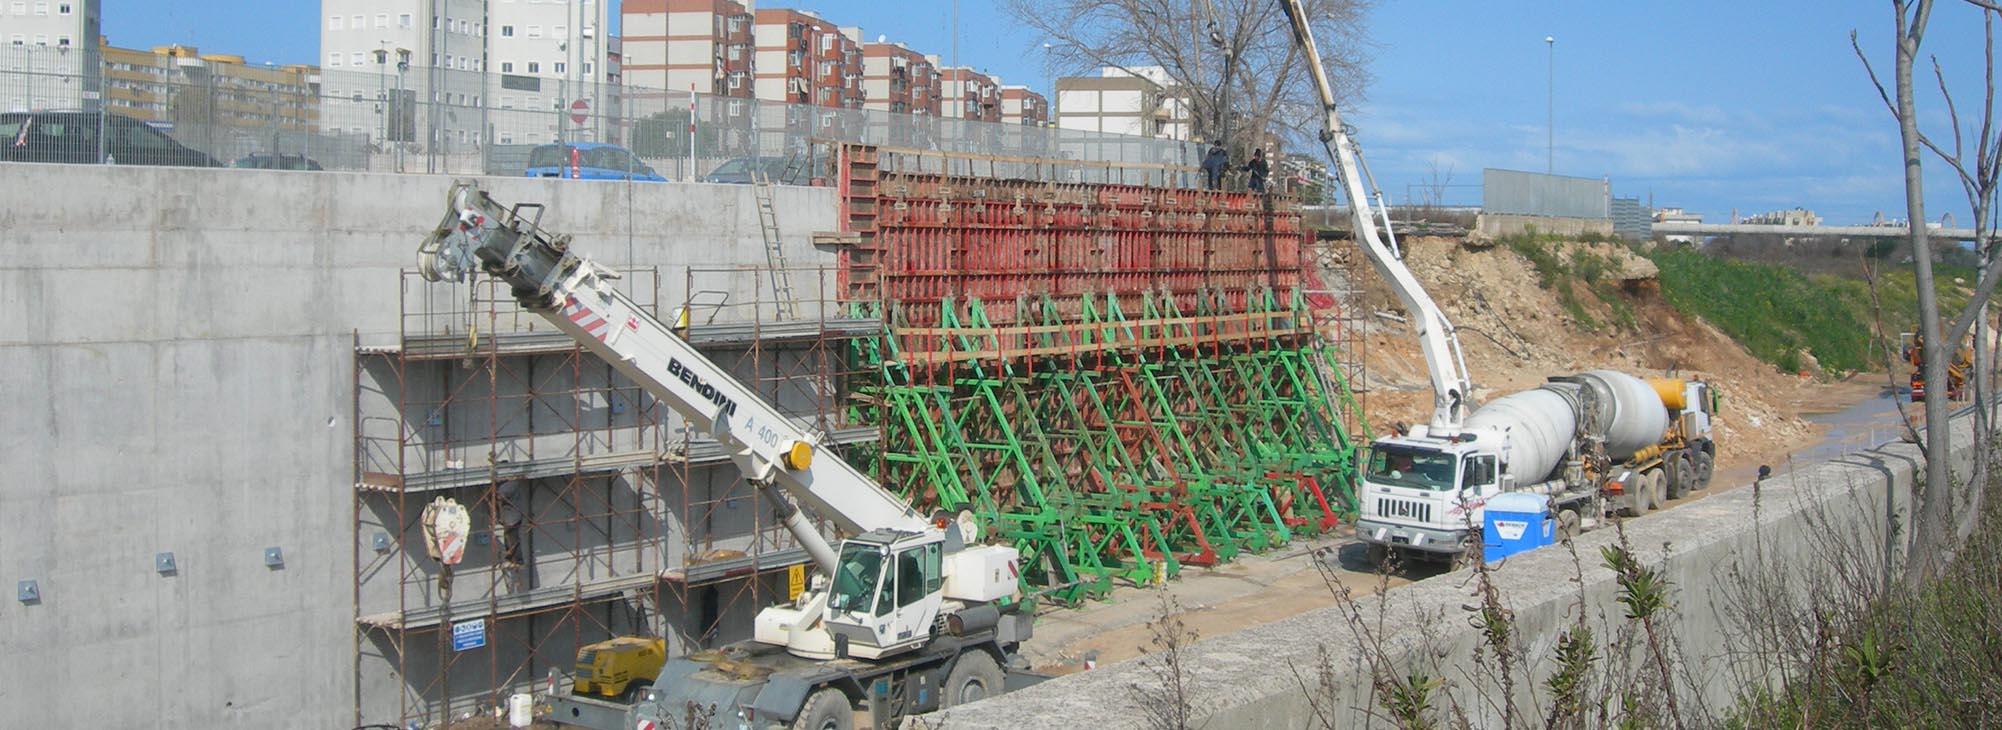 Imprese Di Costruzioni Roma ing. orfeo mazzitelli - impresa di costruzioni e opere edili